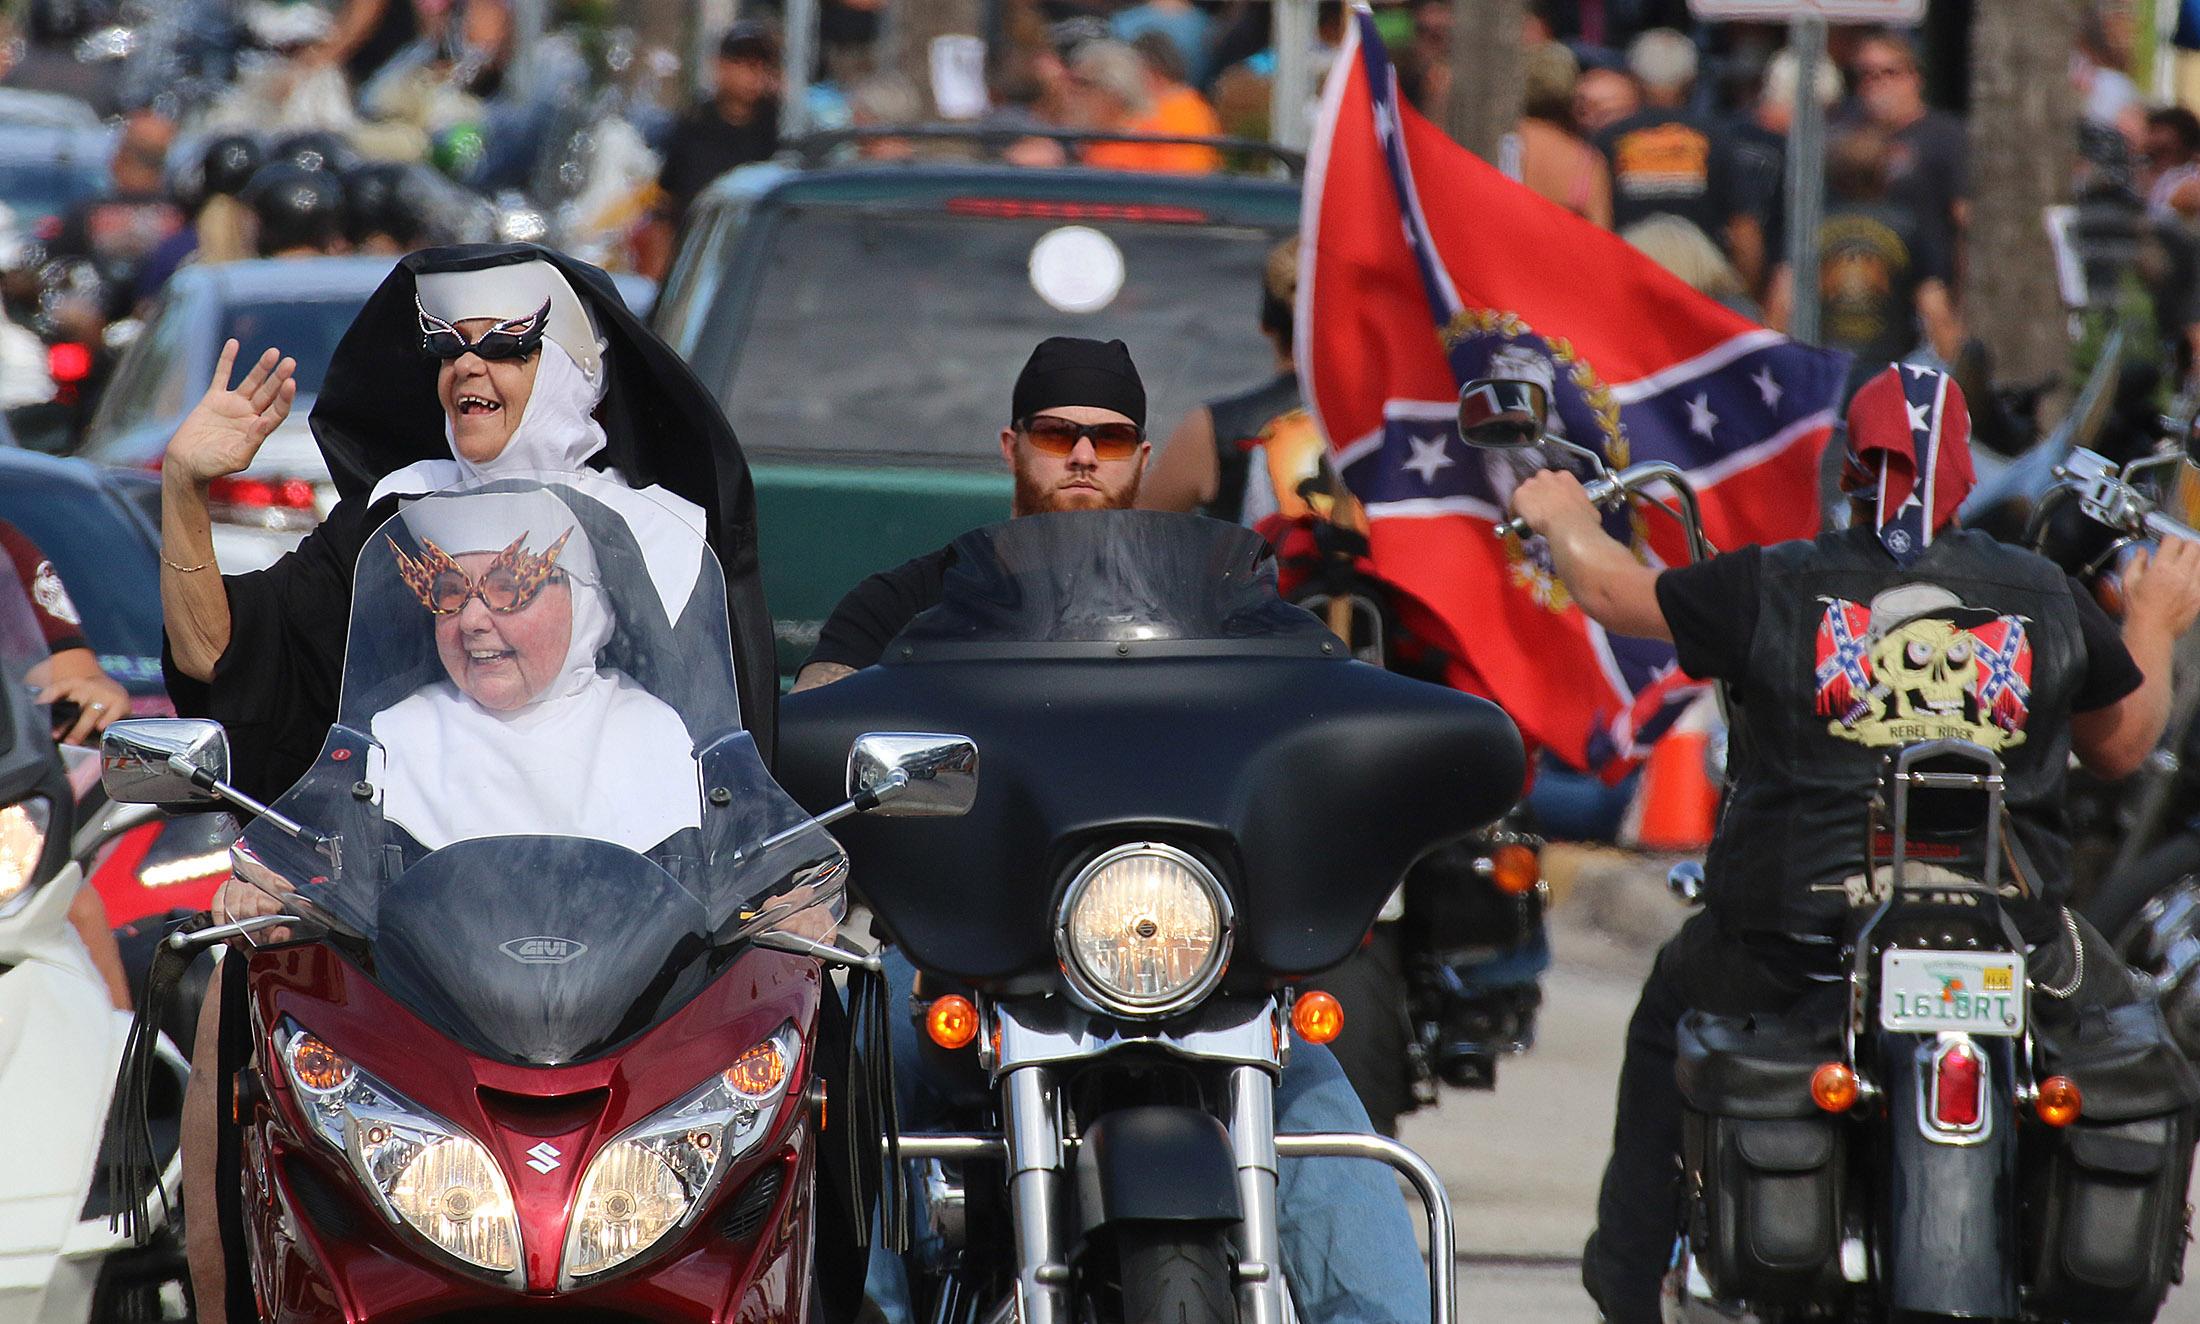 Images from day three of Biketoberfest 2015 on Main Street in Daytona Beach Saturday October 17, 2015. News-Journal/JIM TILLER